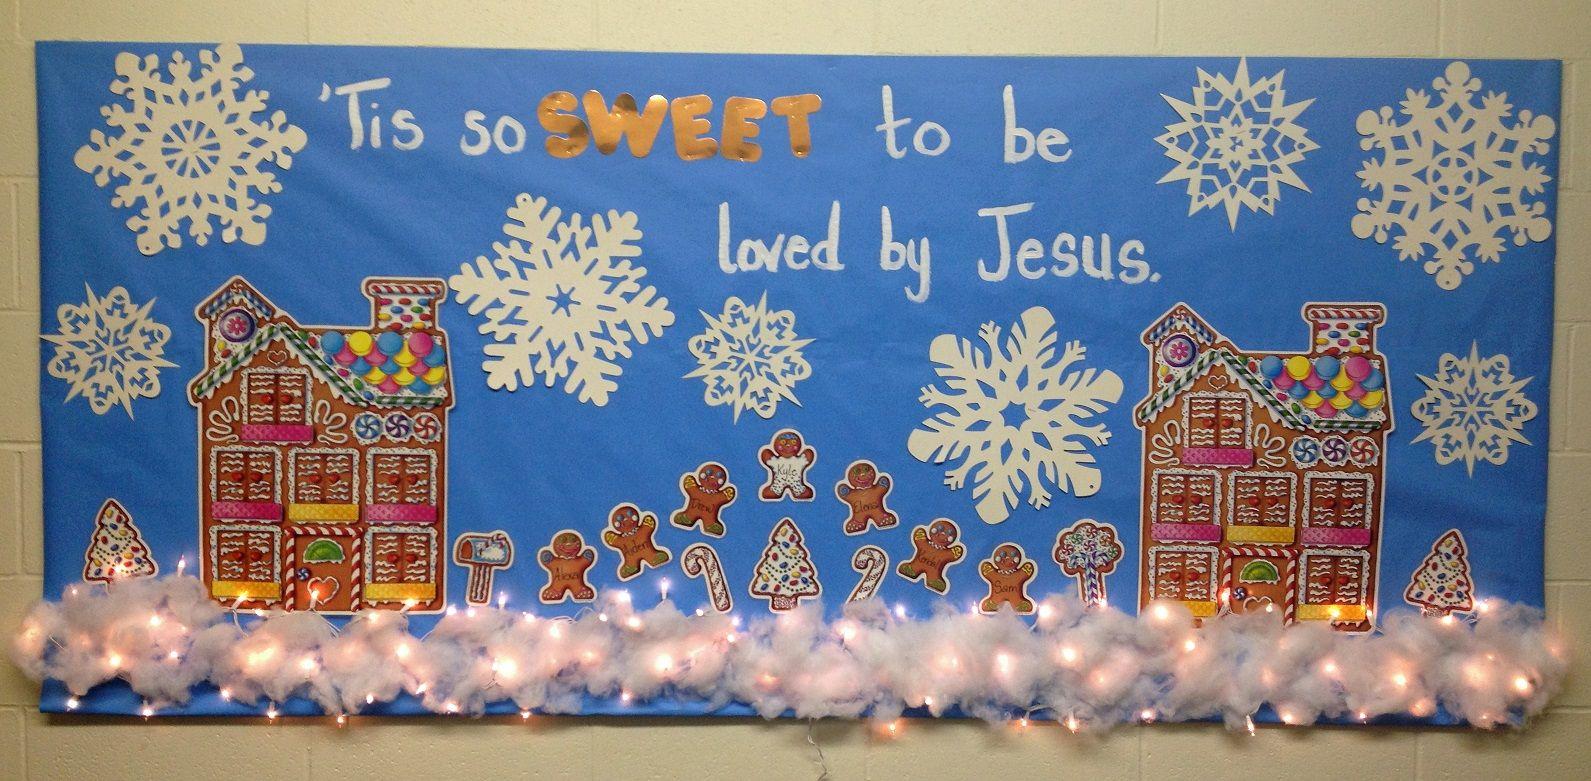 Richfield Church Of Christ Mn Winter Bulletin Board Idea For 2 3